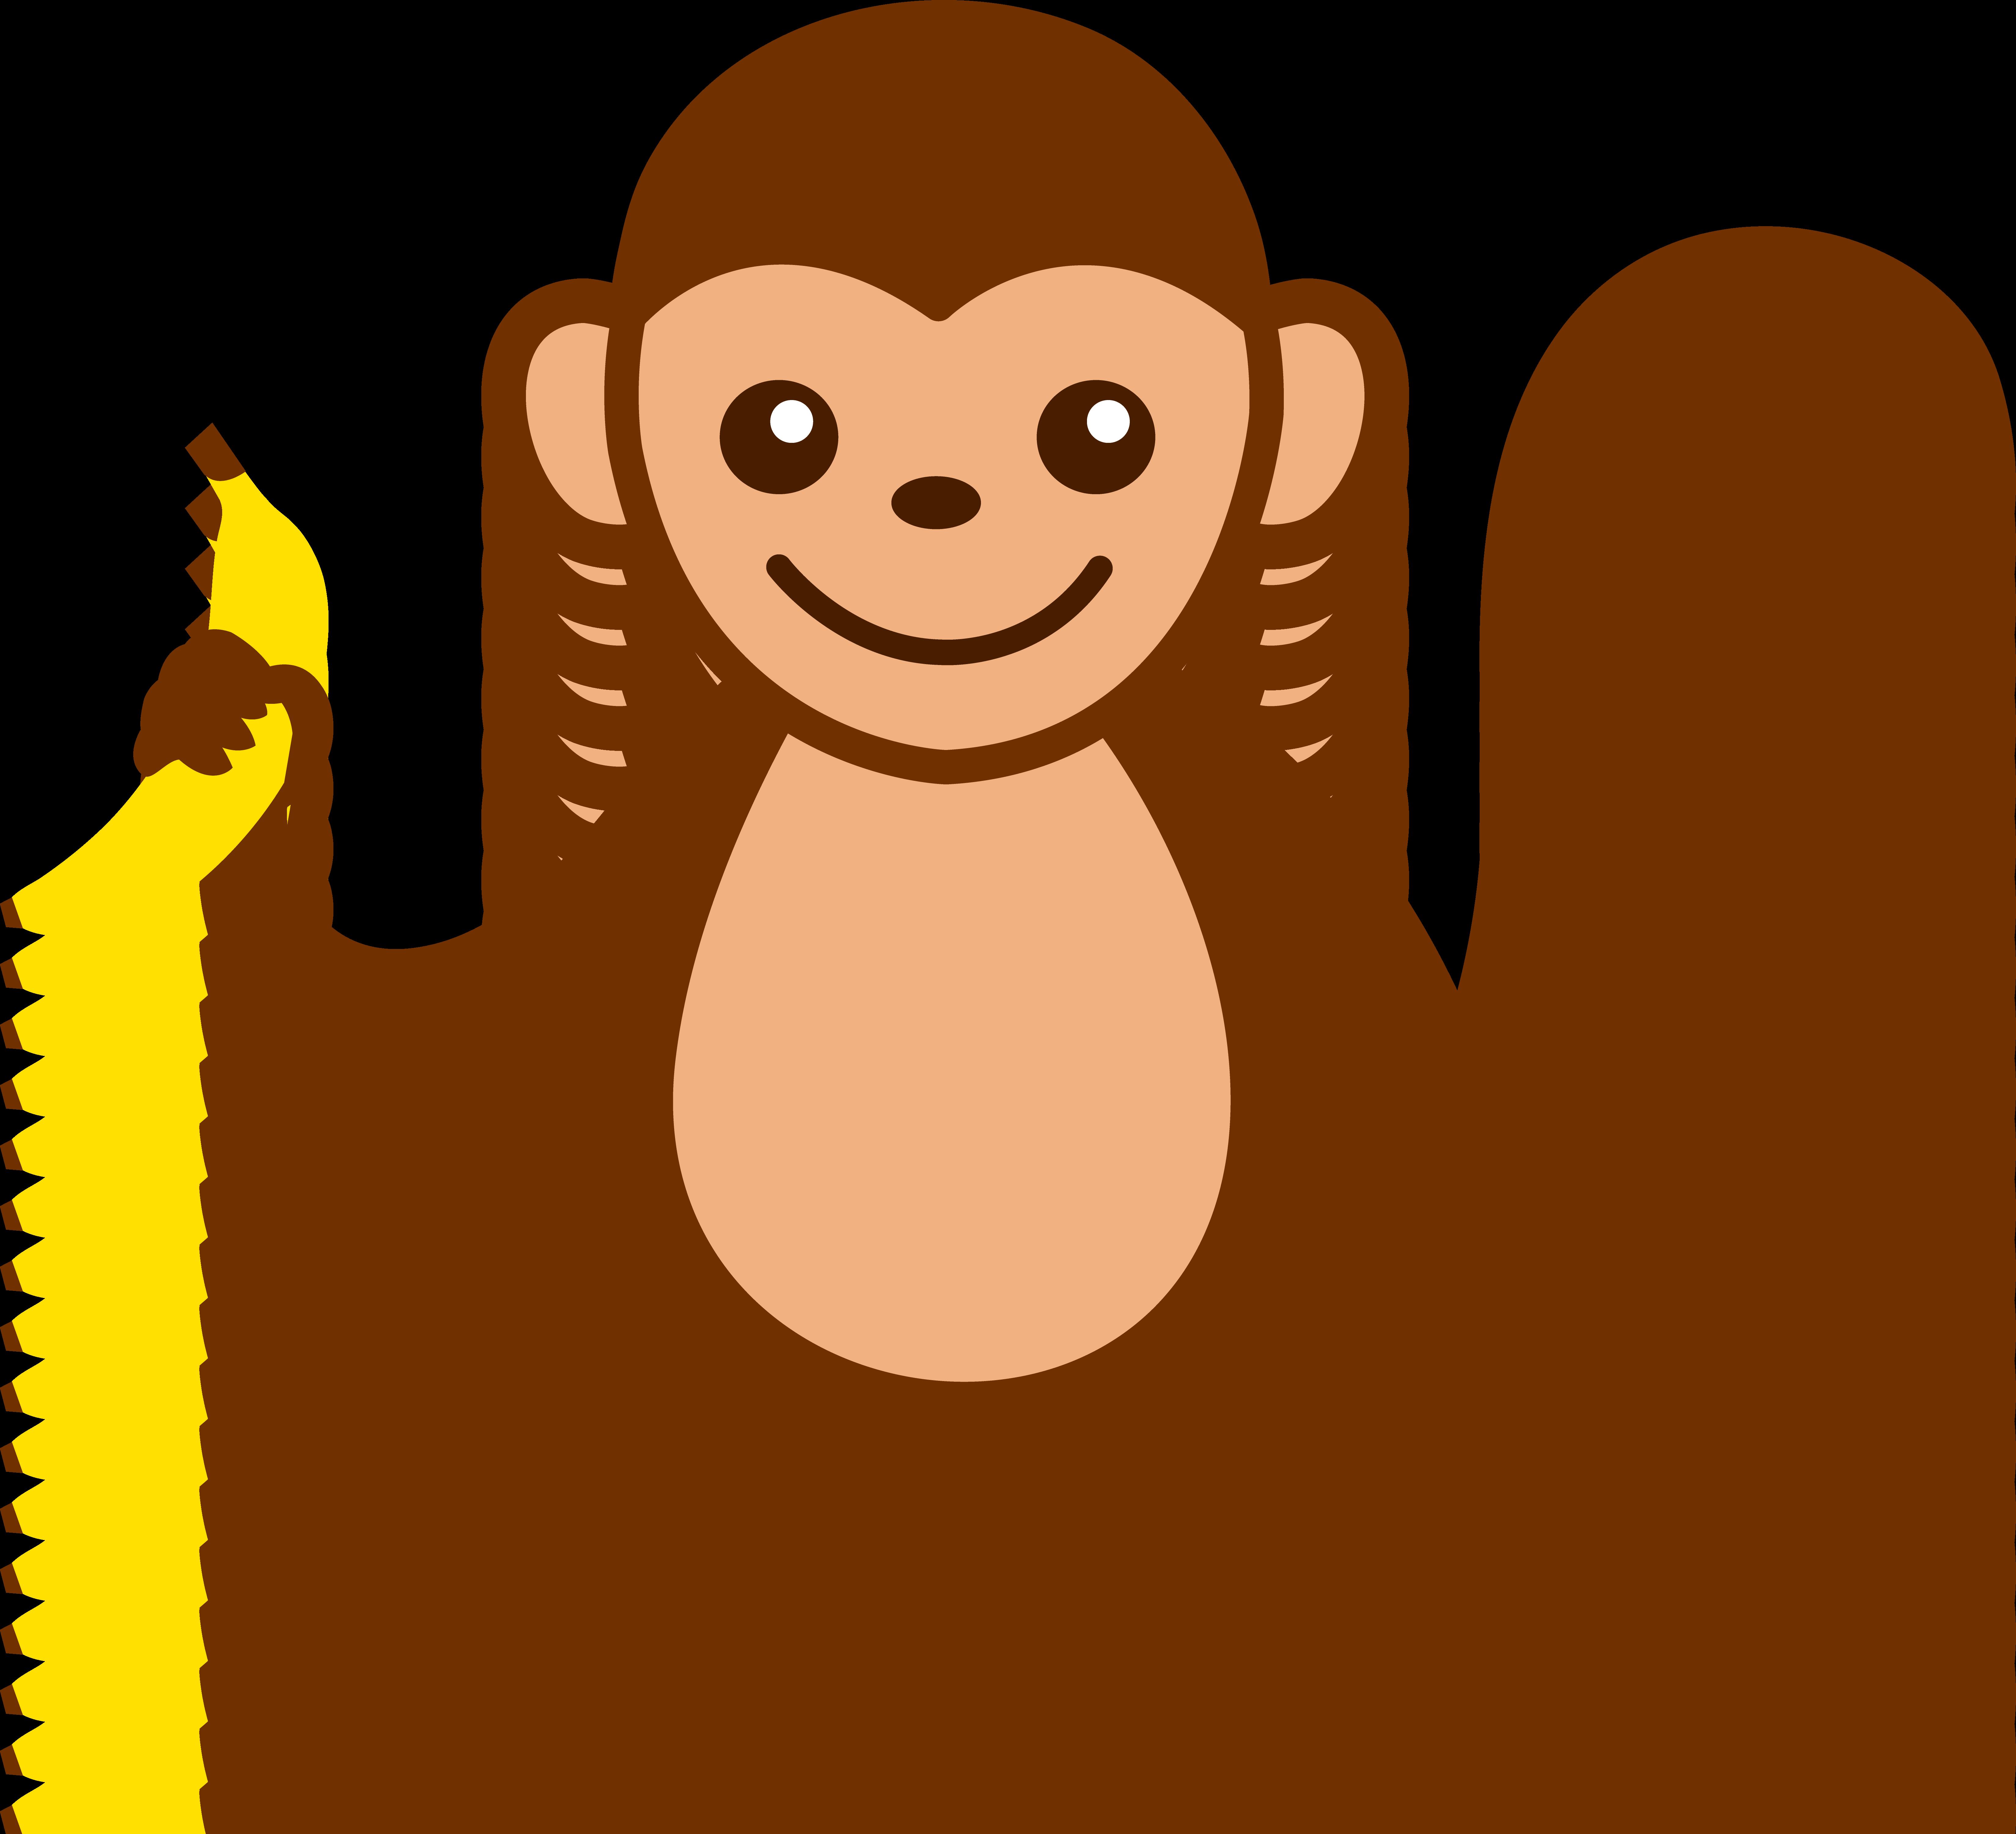 6597x6001 Cute Monkey With Banana